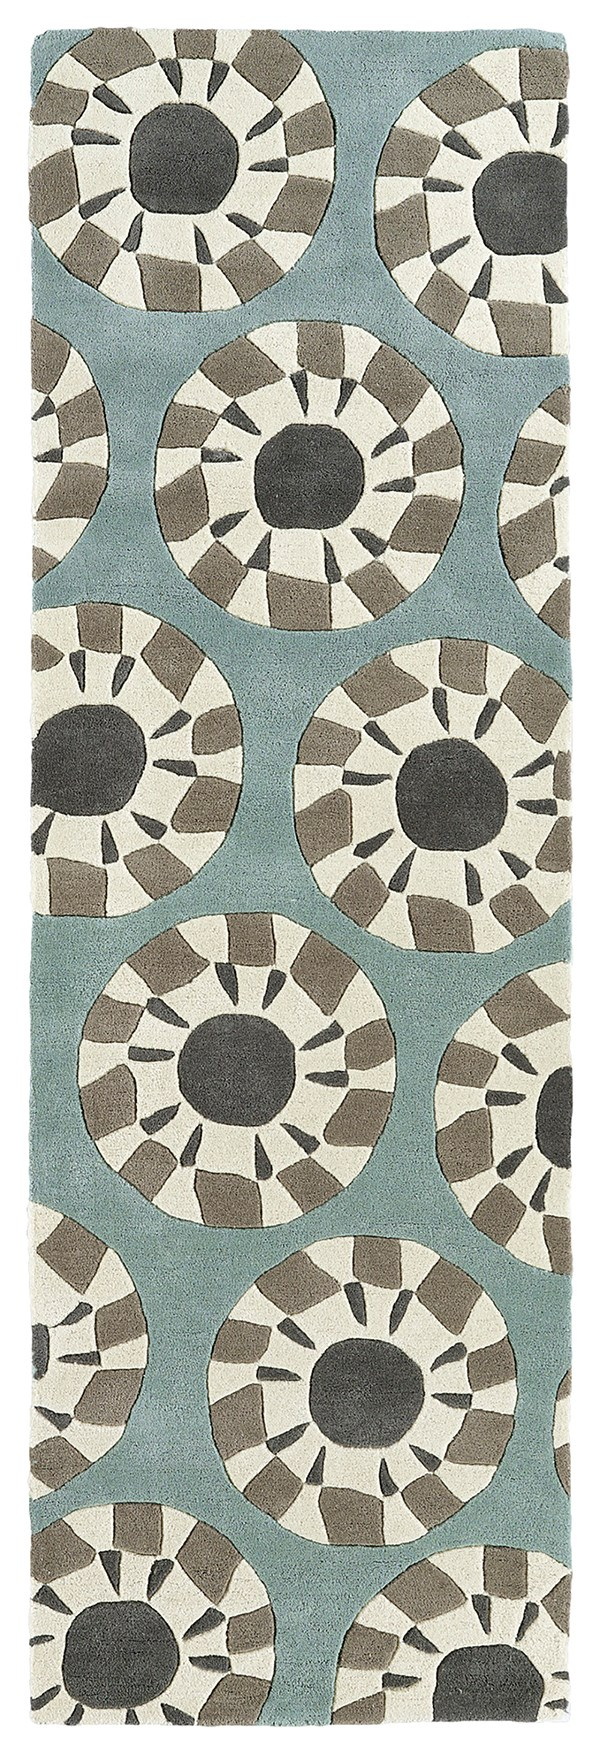 Grey, Ivory, Dark Turquoise, Medium Grey (75) Geometric Area Rug